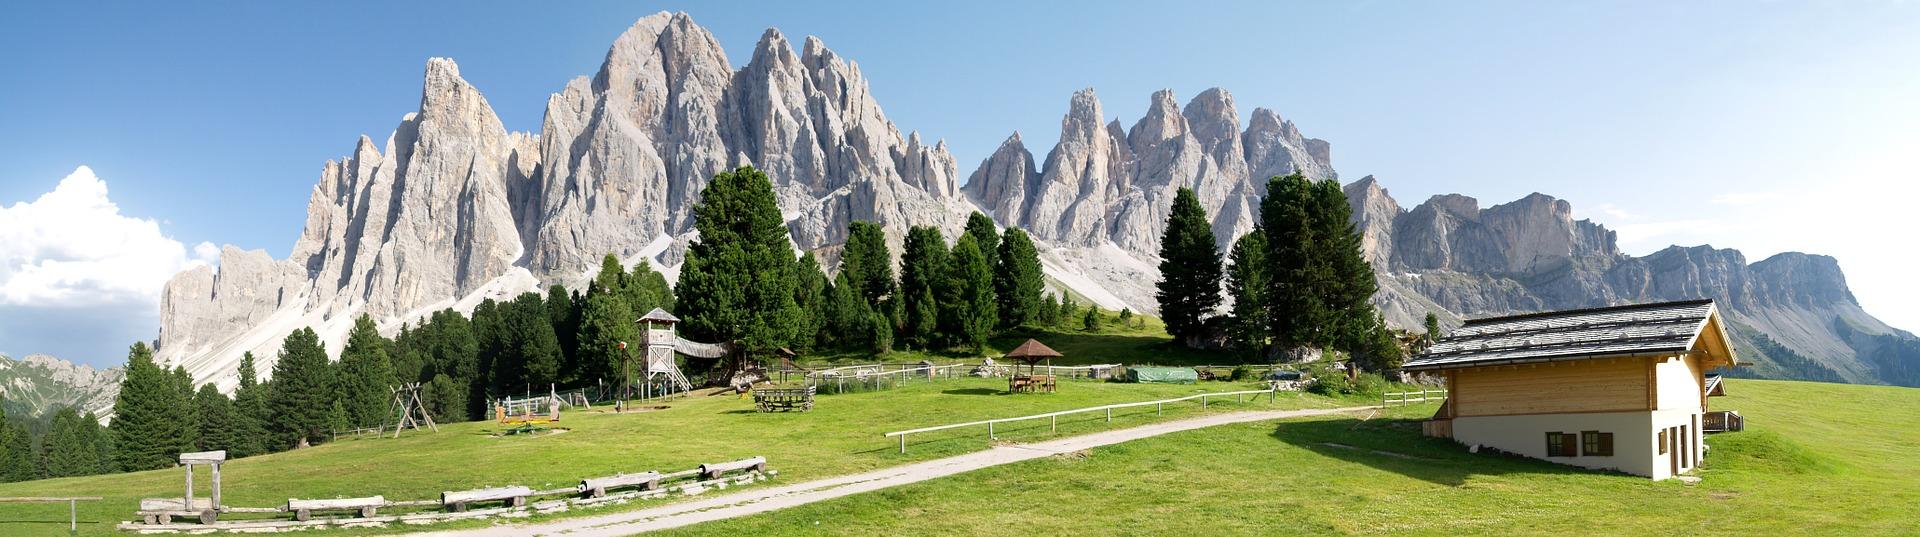 Sued Tirol Dolomiten